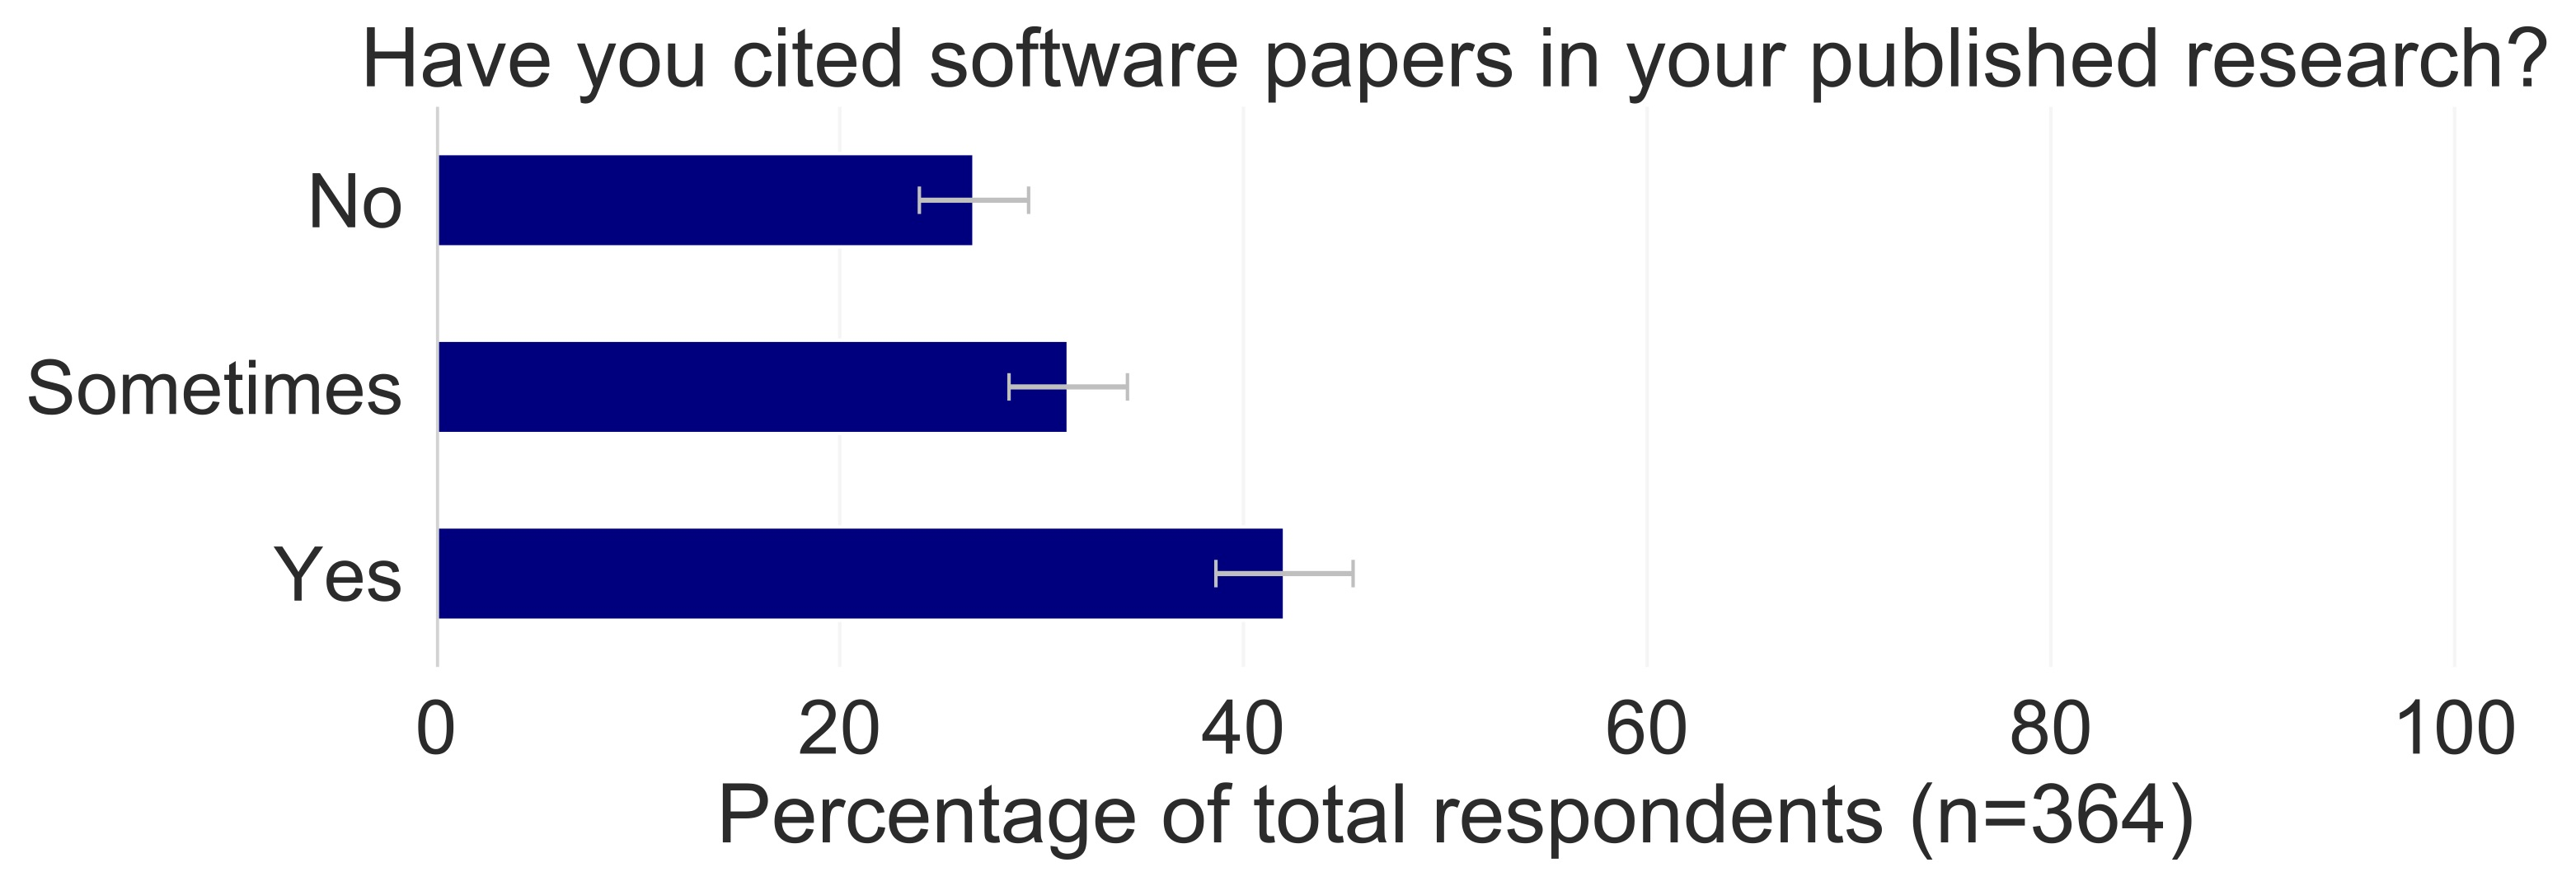 https://d33wubrfki0l68.cloudfront.net/c0124d7d925feedfe3158cdc7b3ab88abe767314/bbb7f/_images/2020-04-27-sunpy_survey_figure4.jpg